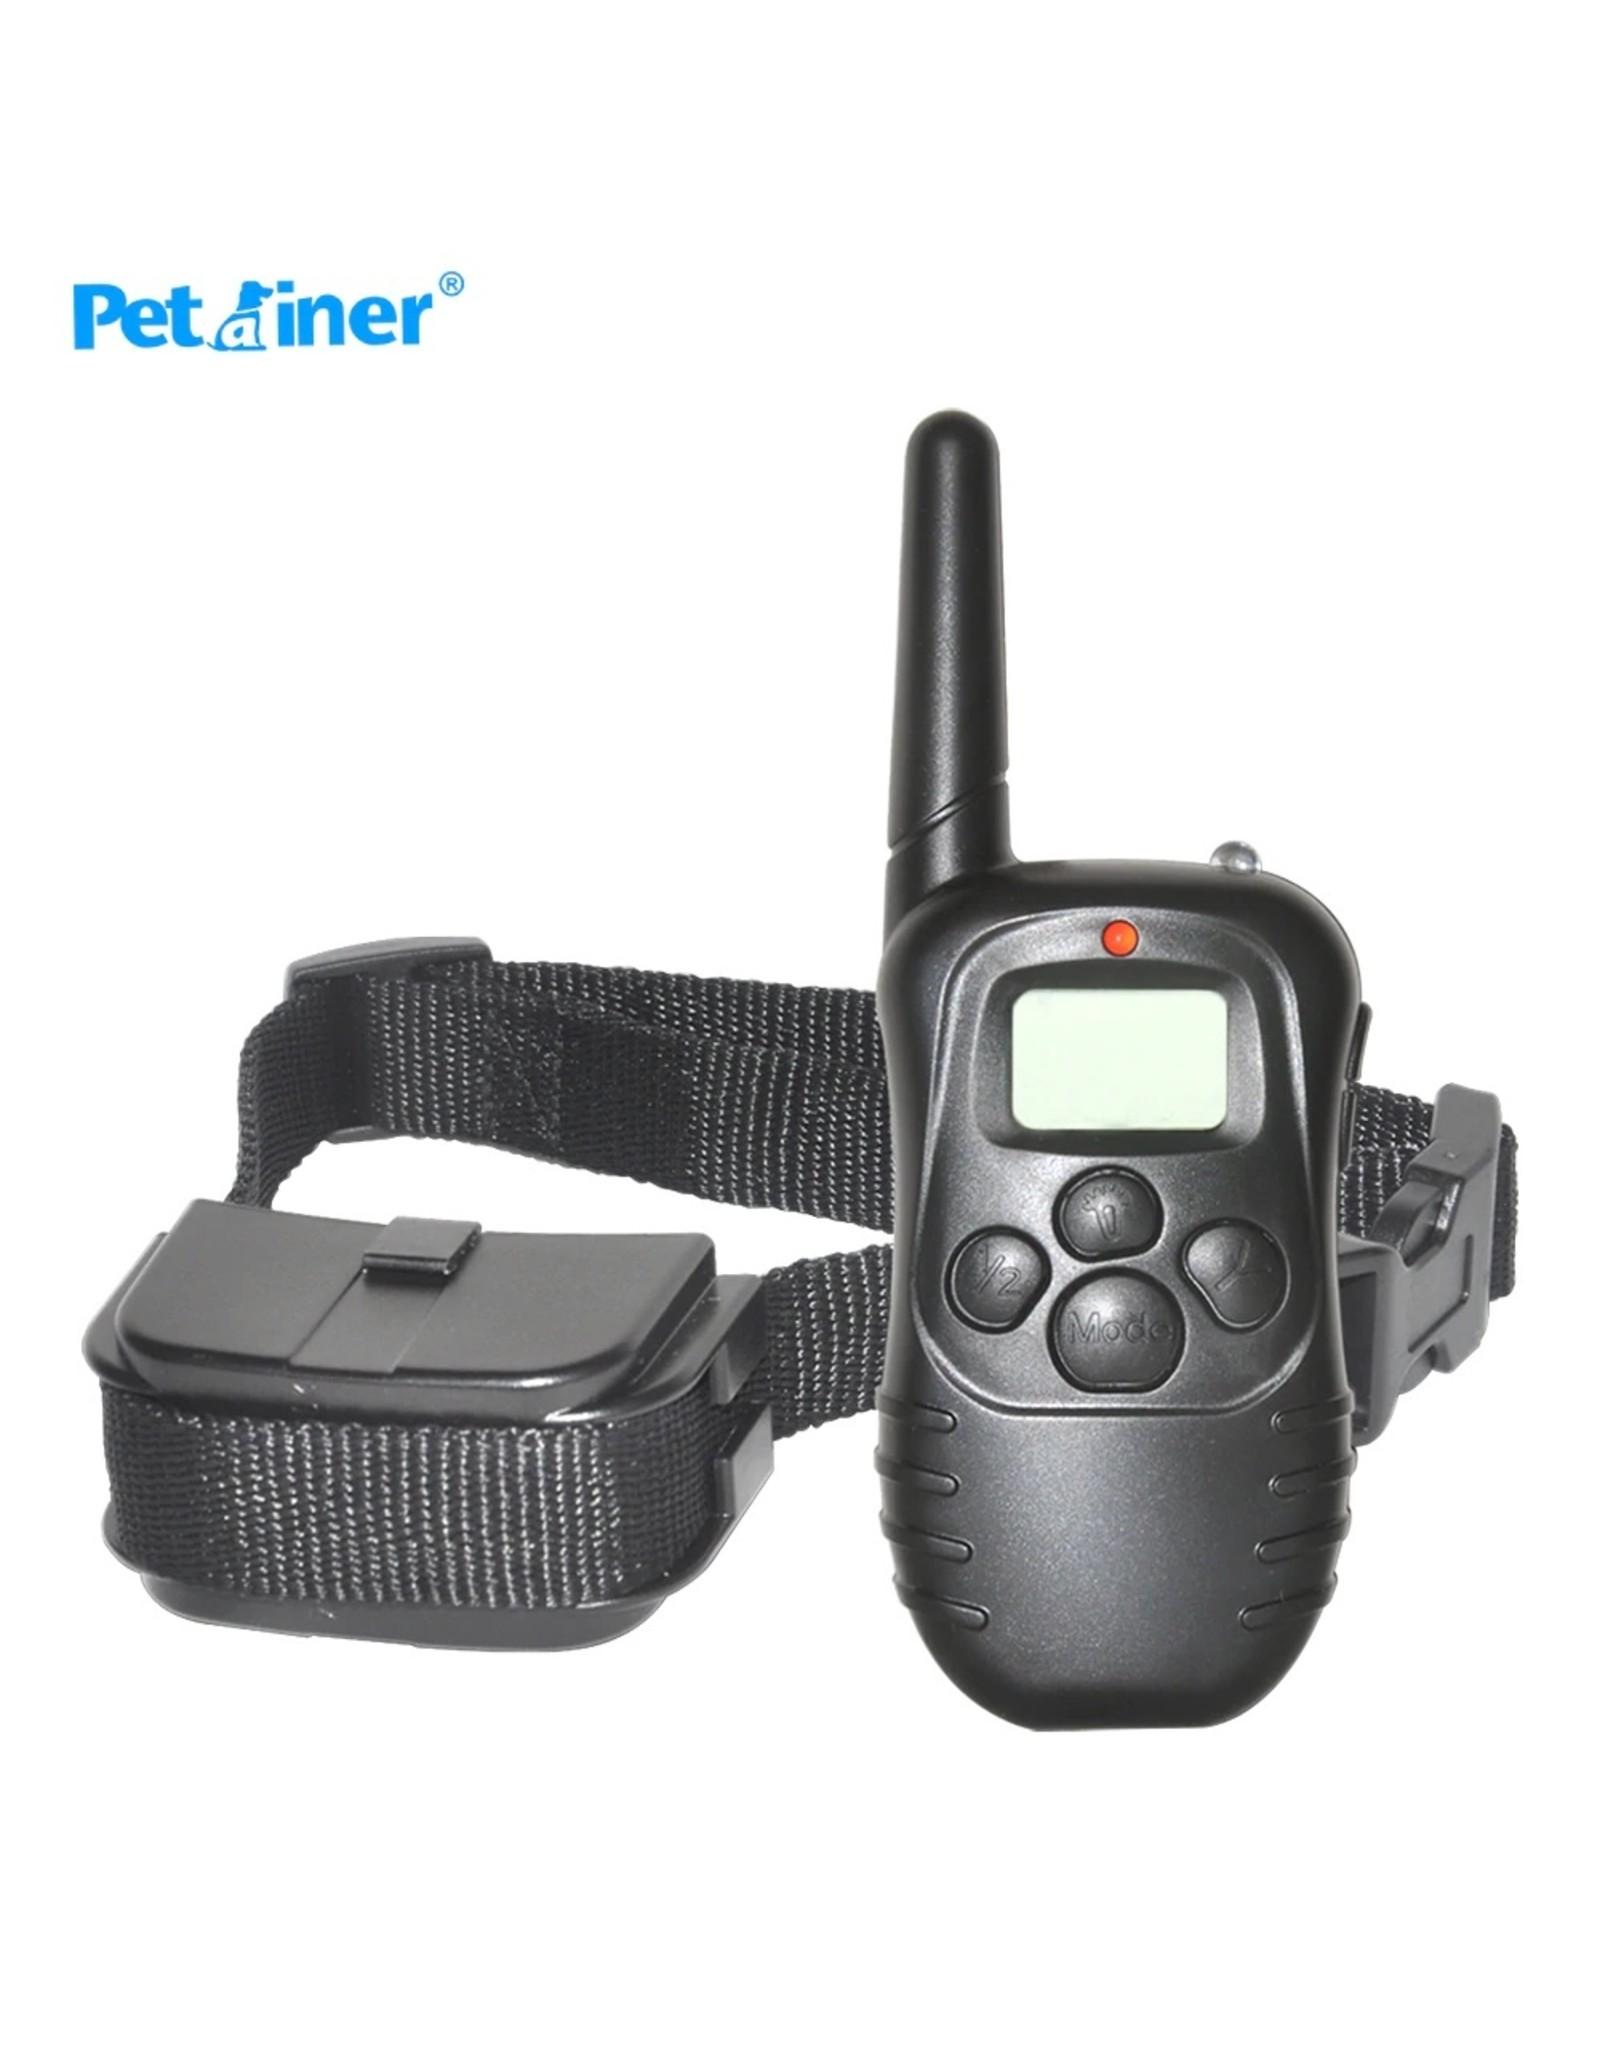 Trainingshalsband - trainingsband voor u hond met afstandsbediening - Trainingsband 998D WT717 - 100 levels - 300 meter - Halsband 25 tot 58 cm